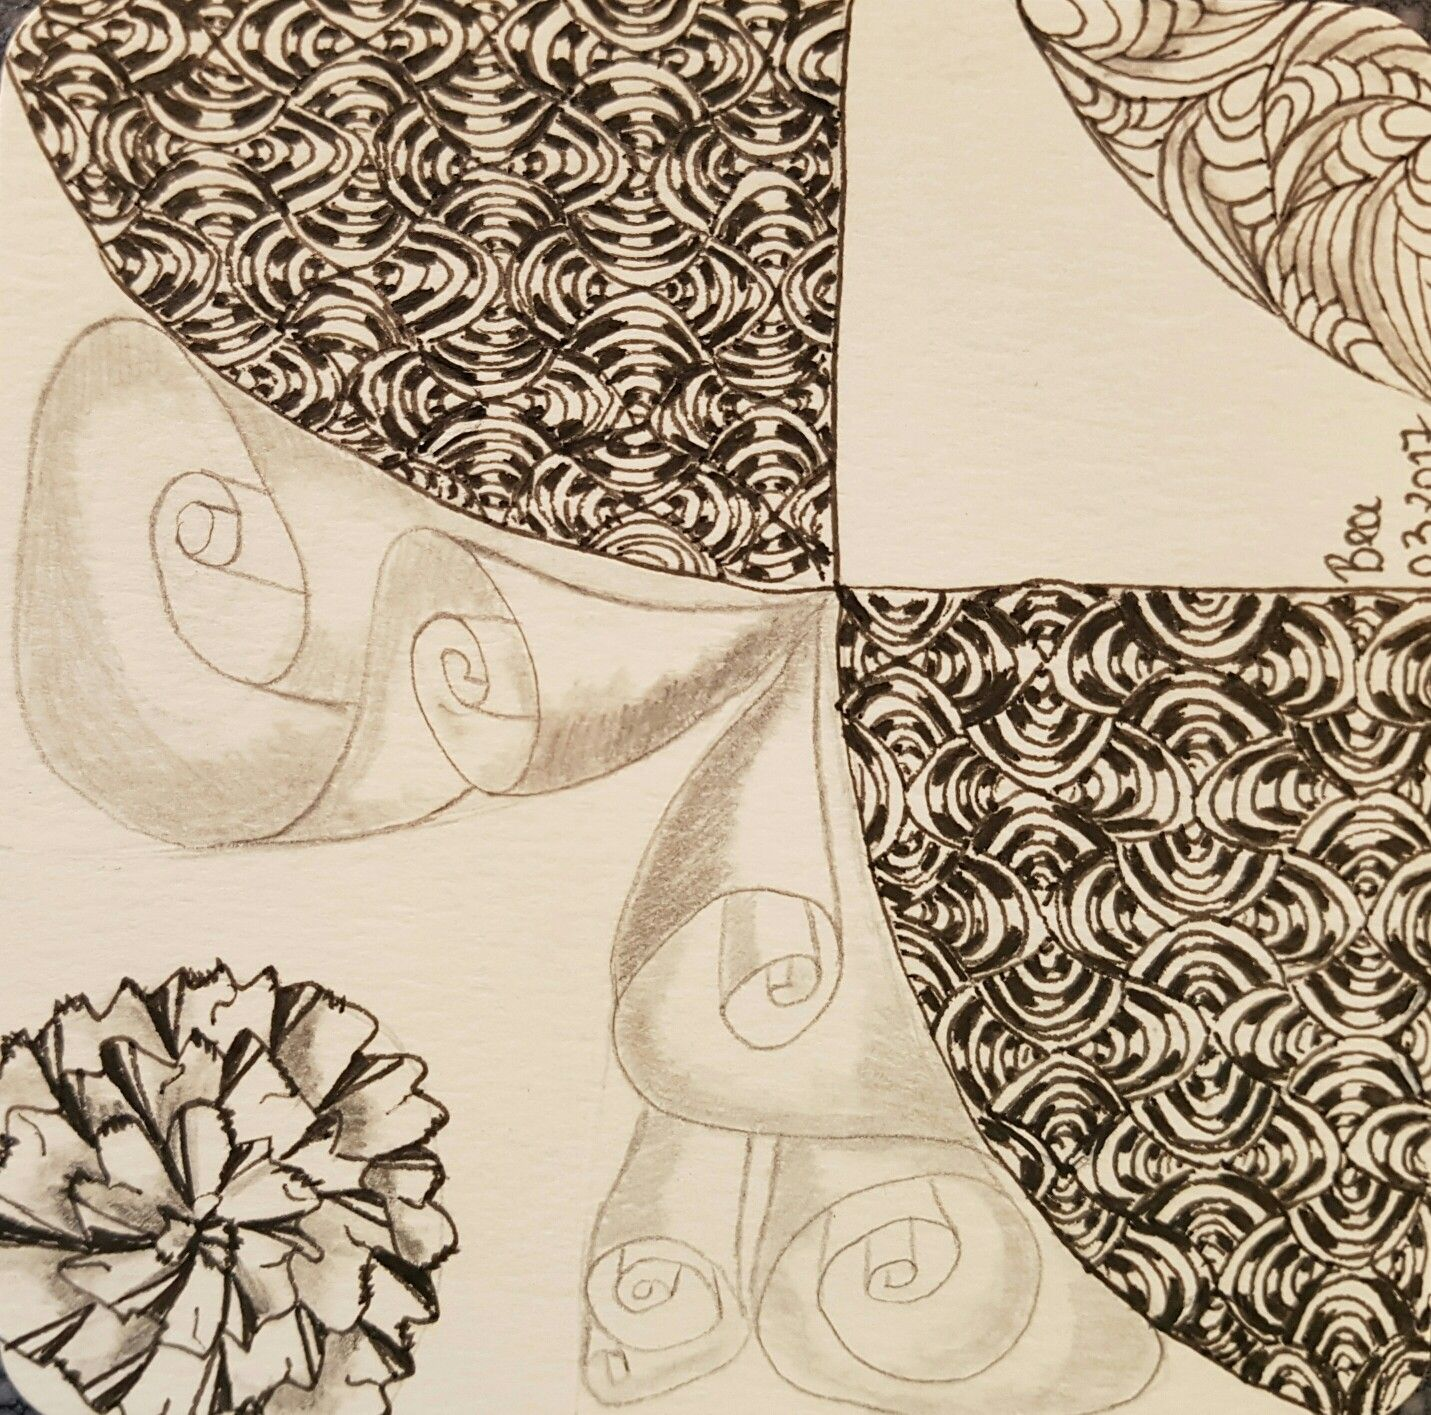 Tangle-Mosaik-Projekt #7